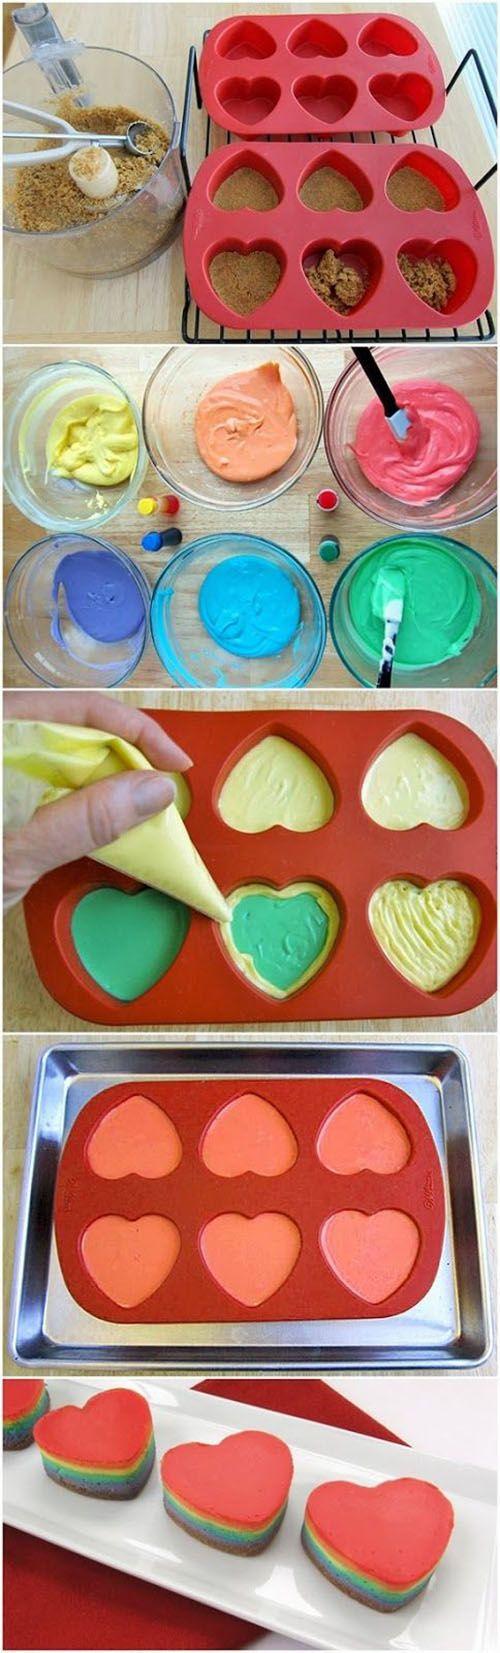 Diy Mini Rainbow Cheesecakes | DIY Crafts Tutorials